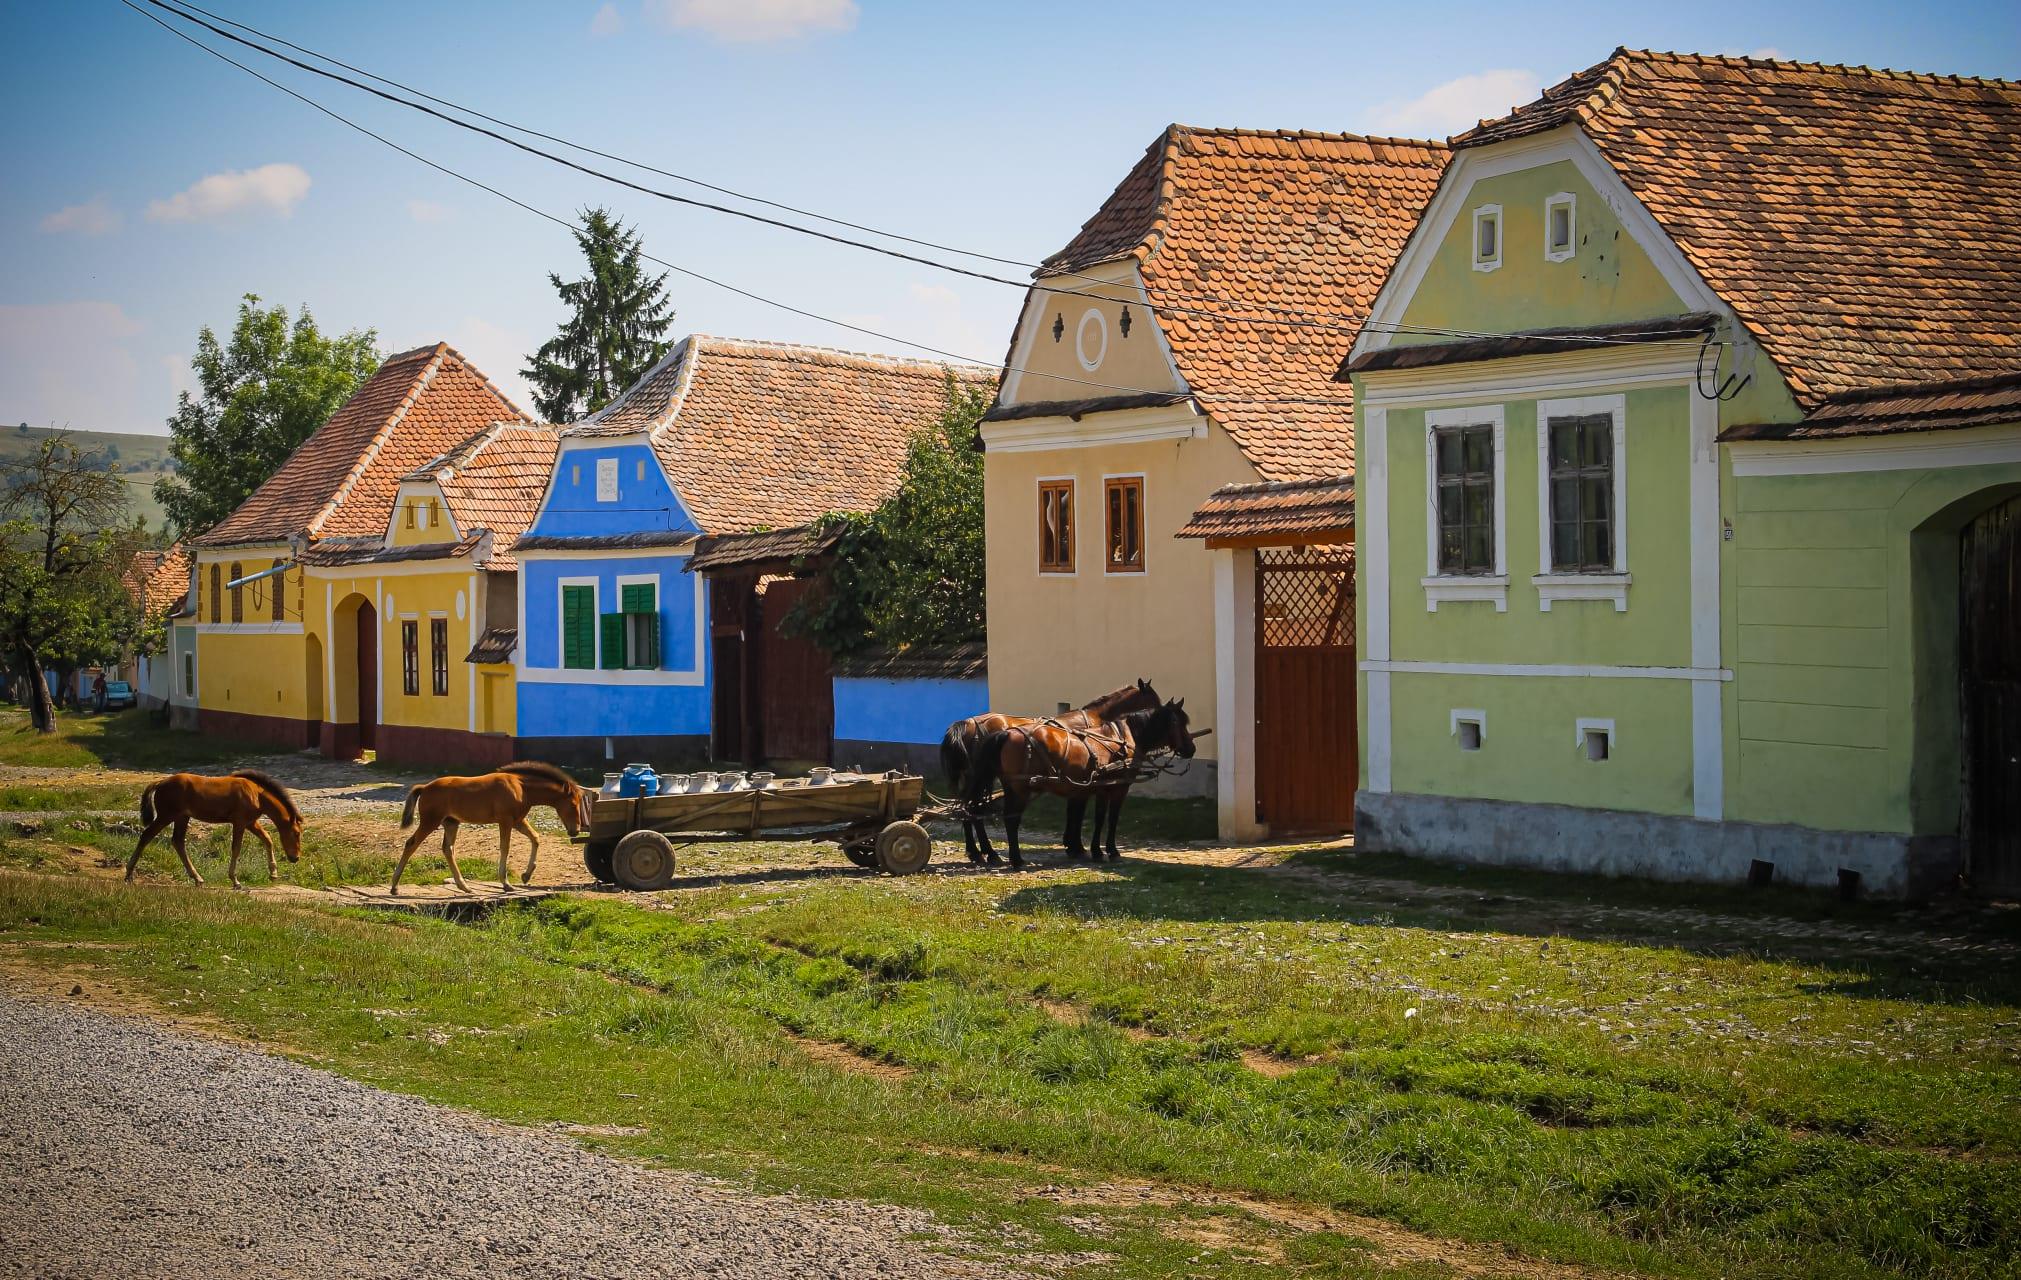 Transylvania - The Treasures of Transylvania: Horse drawn carriage ride through a UNESCO Saxon Village and its Fortified Church